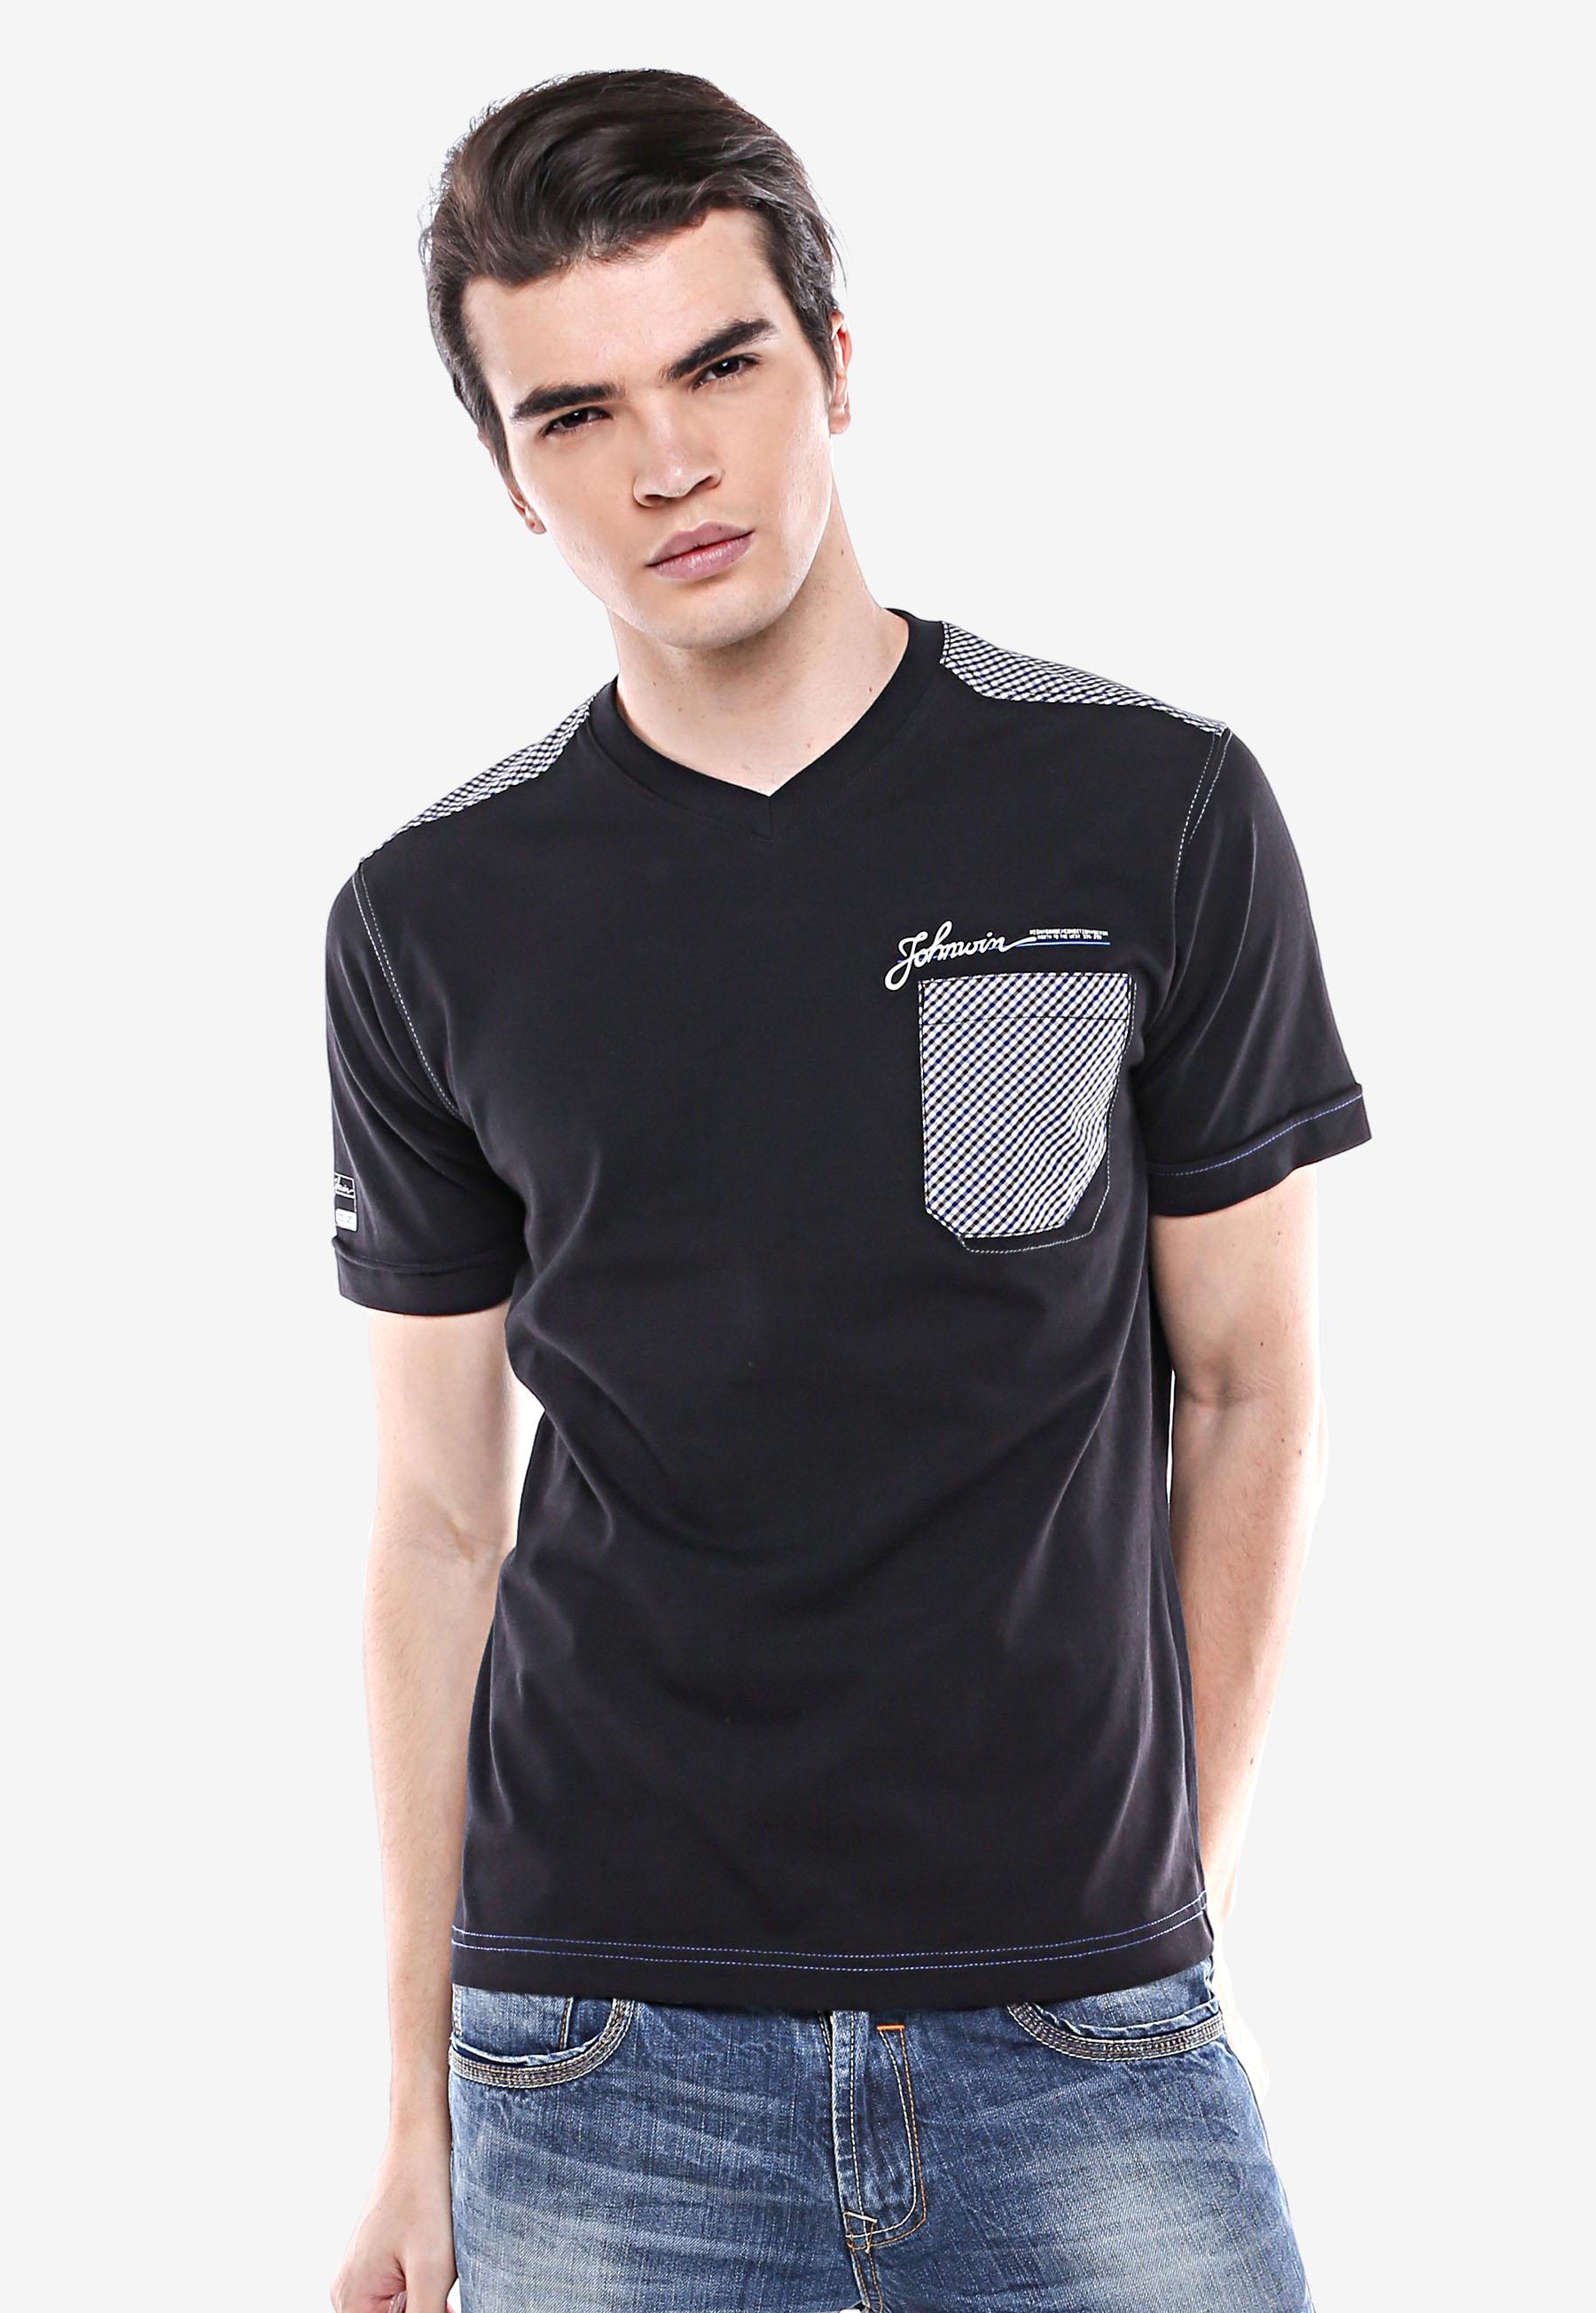 Lgsgeneration Shop Line Lgs Slim Fit Kaos Polo Biru Navy Garis Putih M Casual Hitam Kantong Kotak